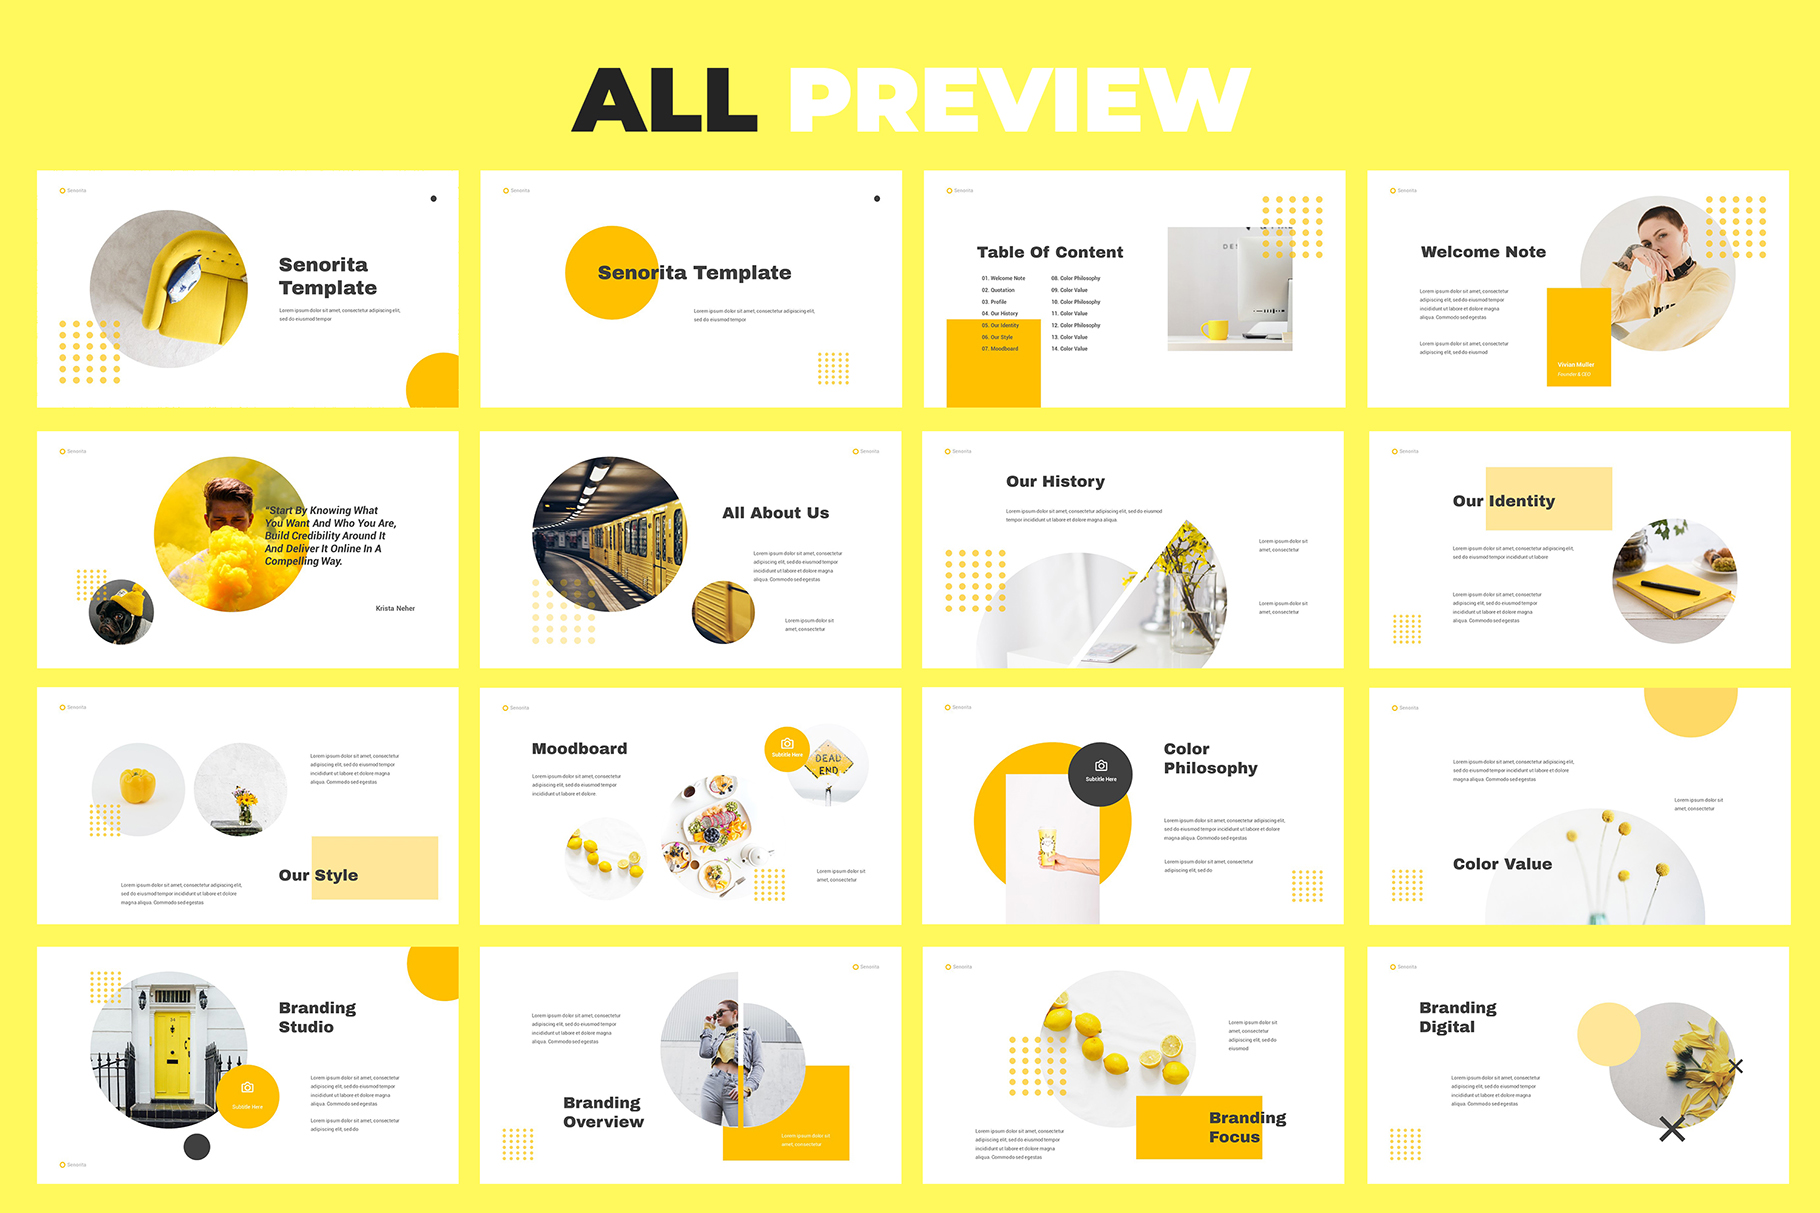 Senorita Brand Guideline Powerpoint example image 5